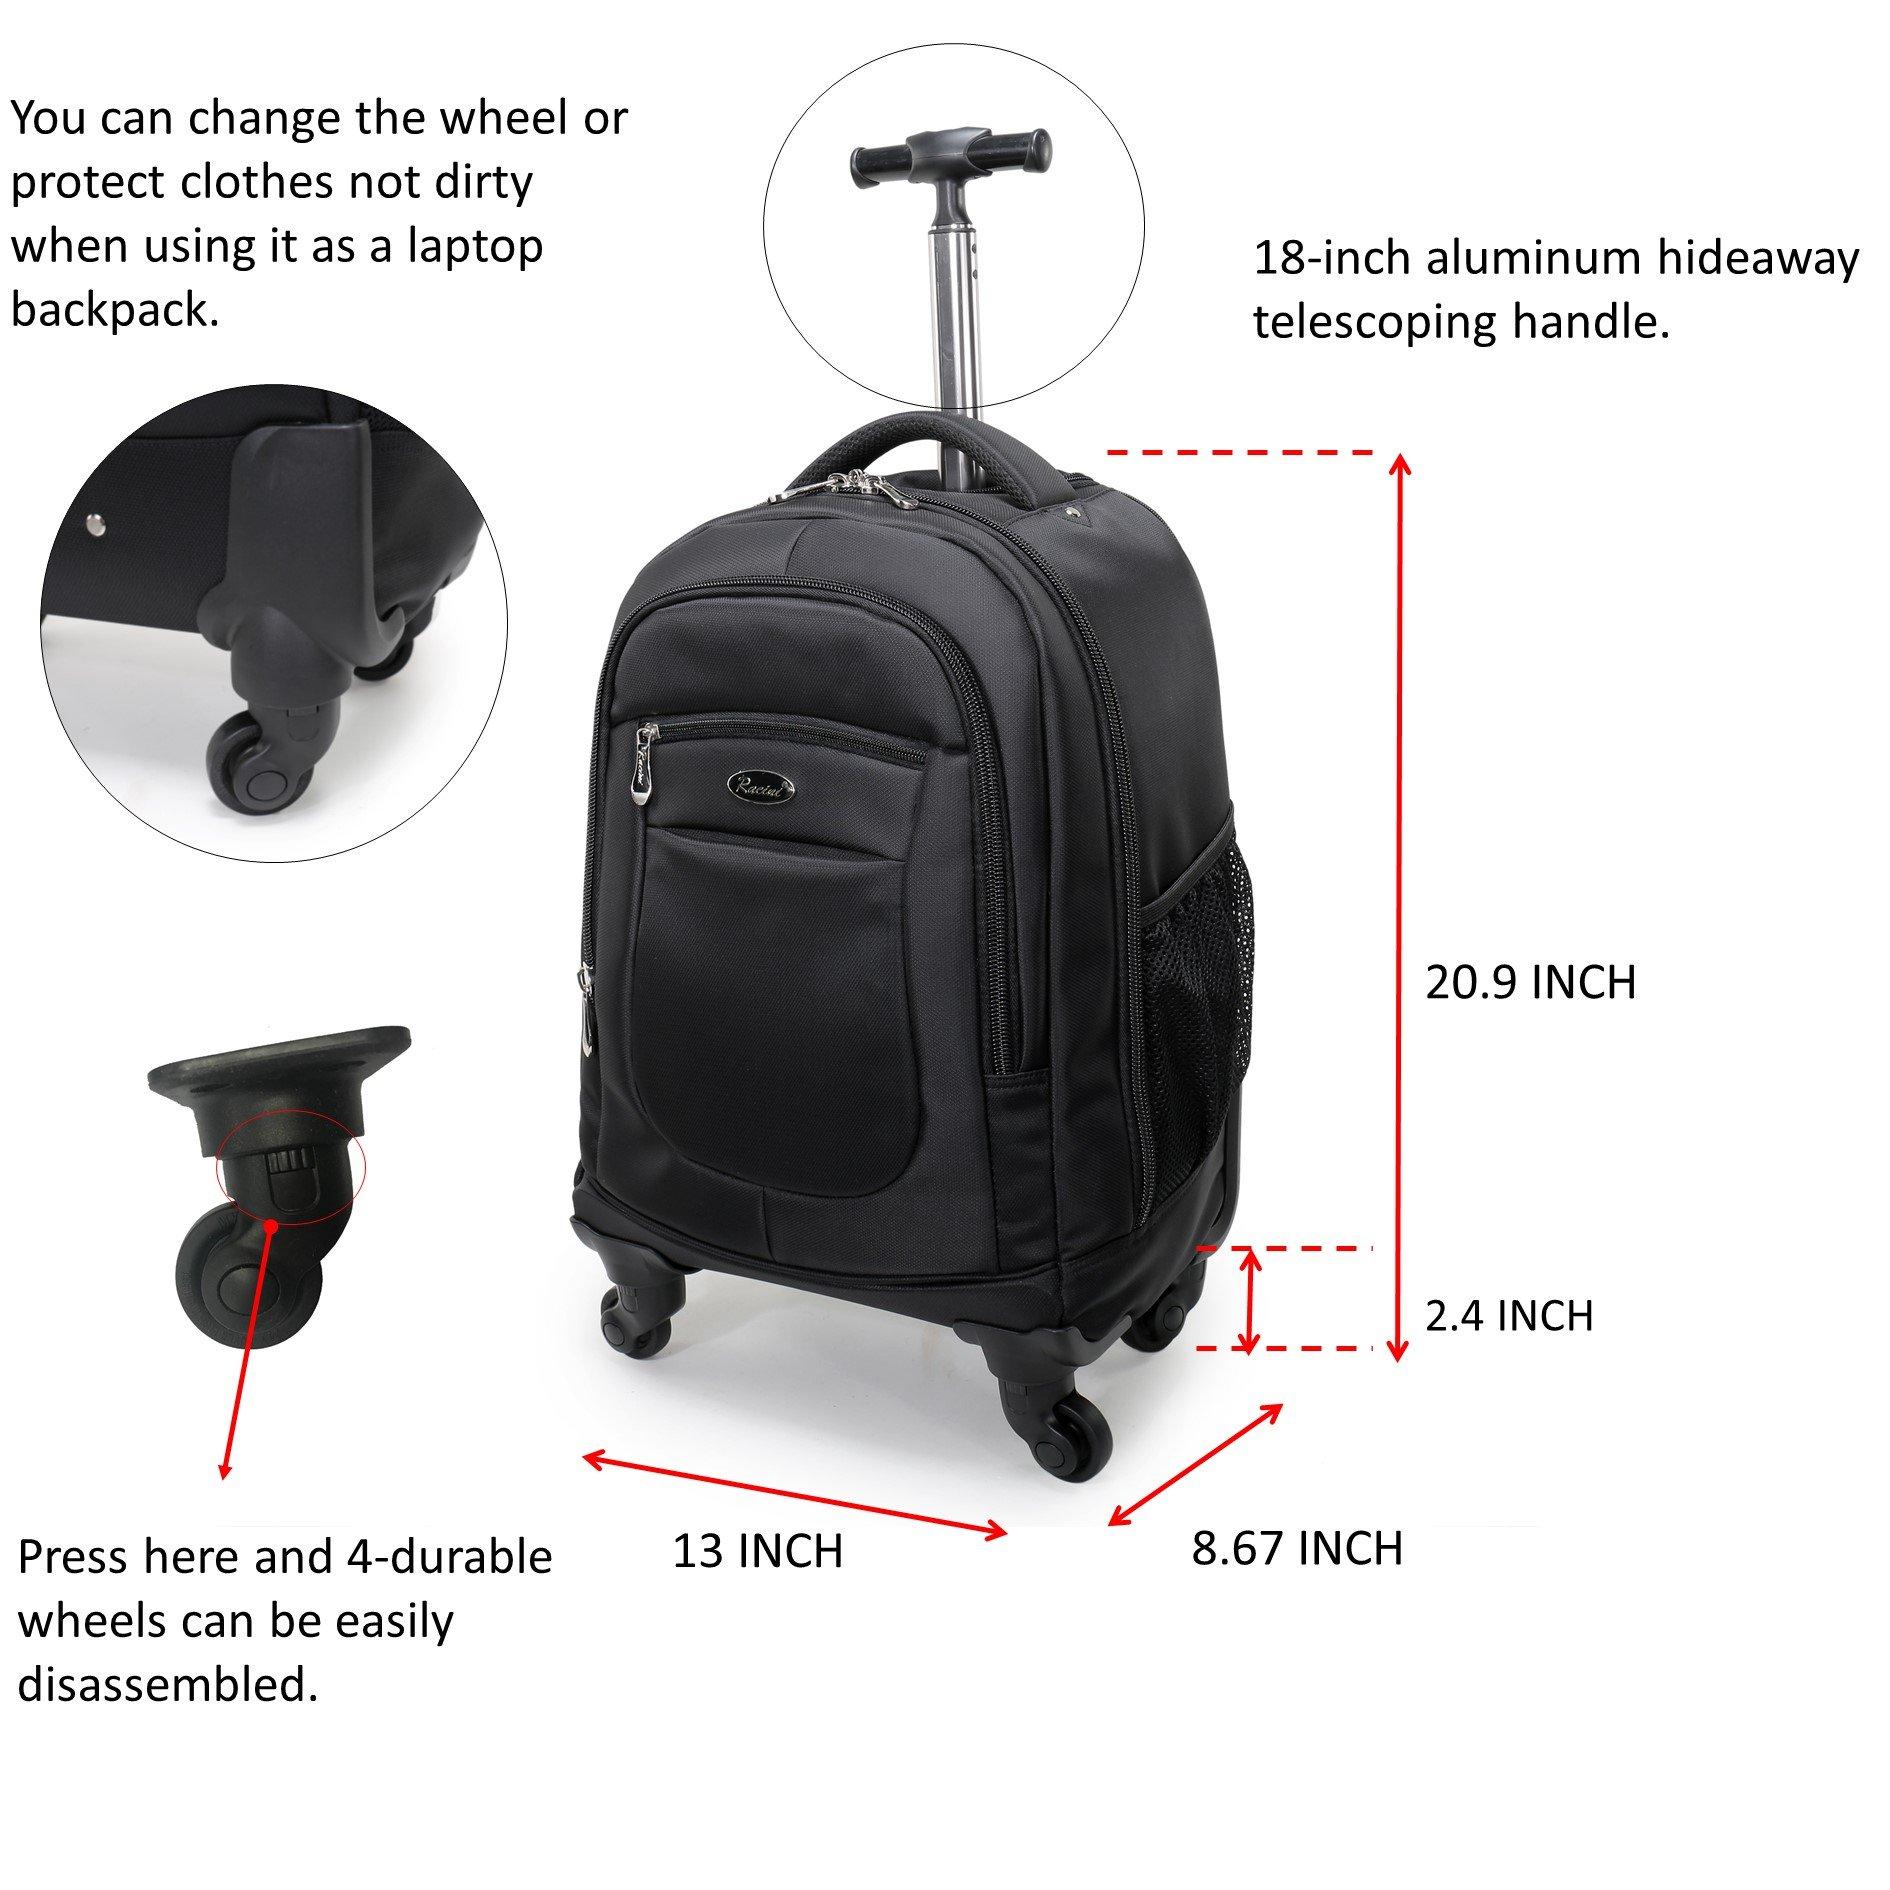 Racini Nylon Waterproof Rolling Backpack, Freewheel Travel School Wheeled Backpack, Carry-on Luggage with Anti-theft Zippers (Black) by Racini (Image #2)